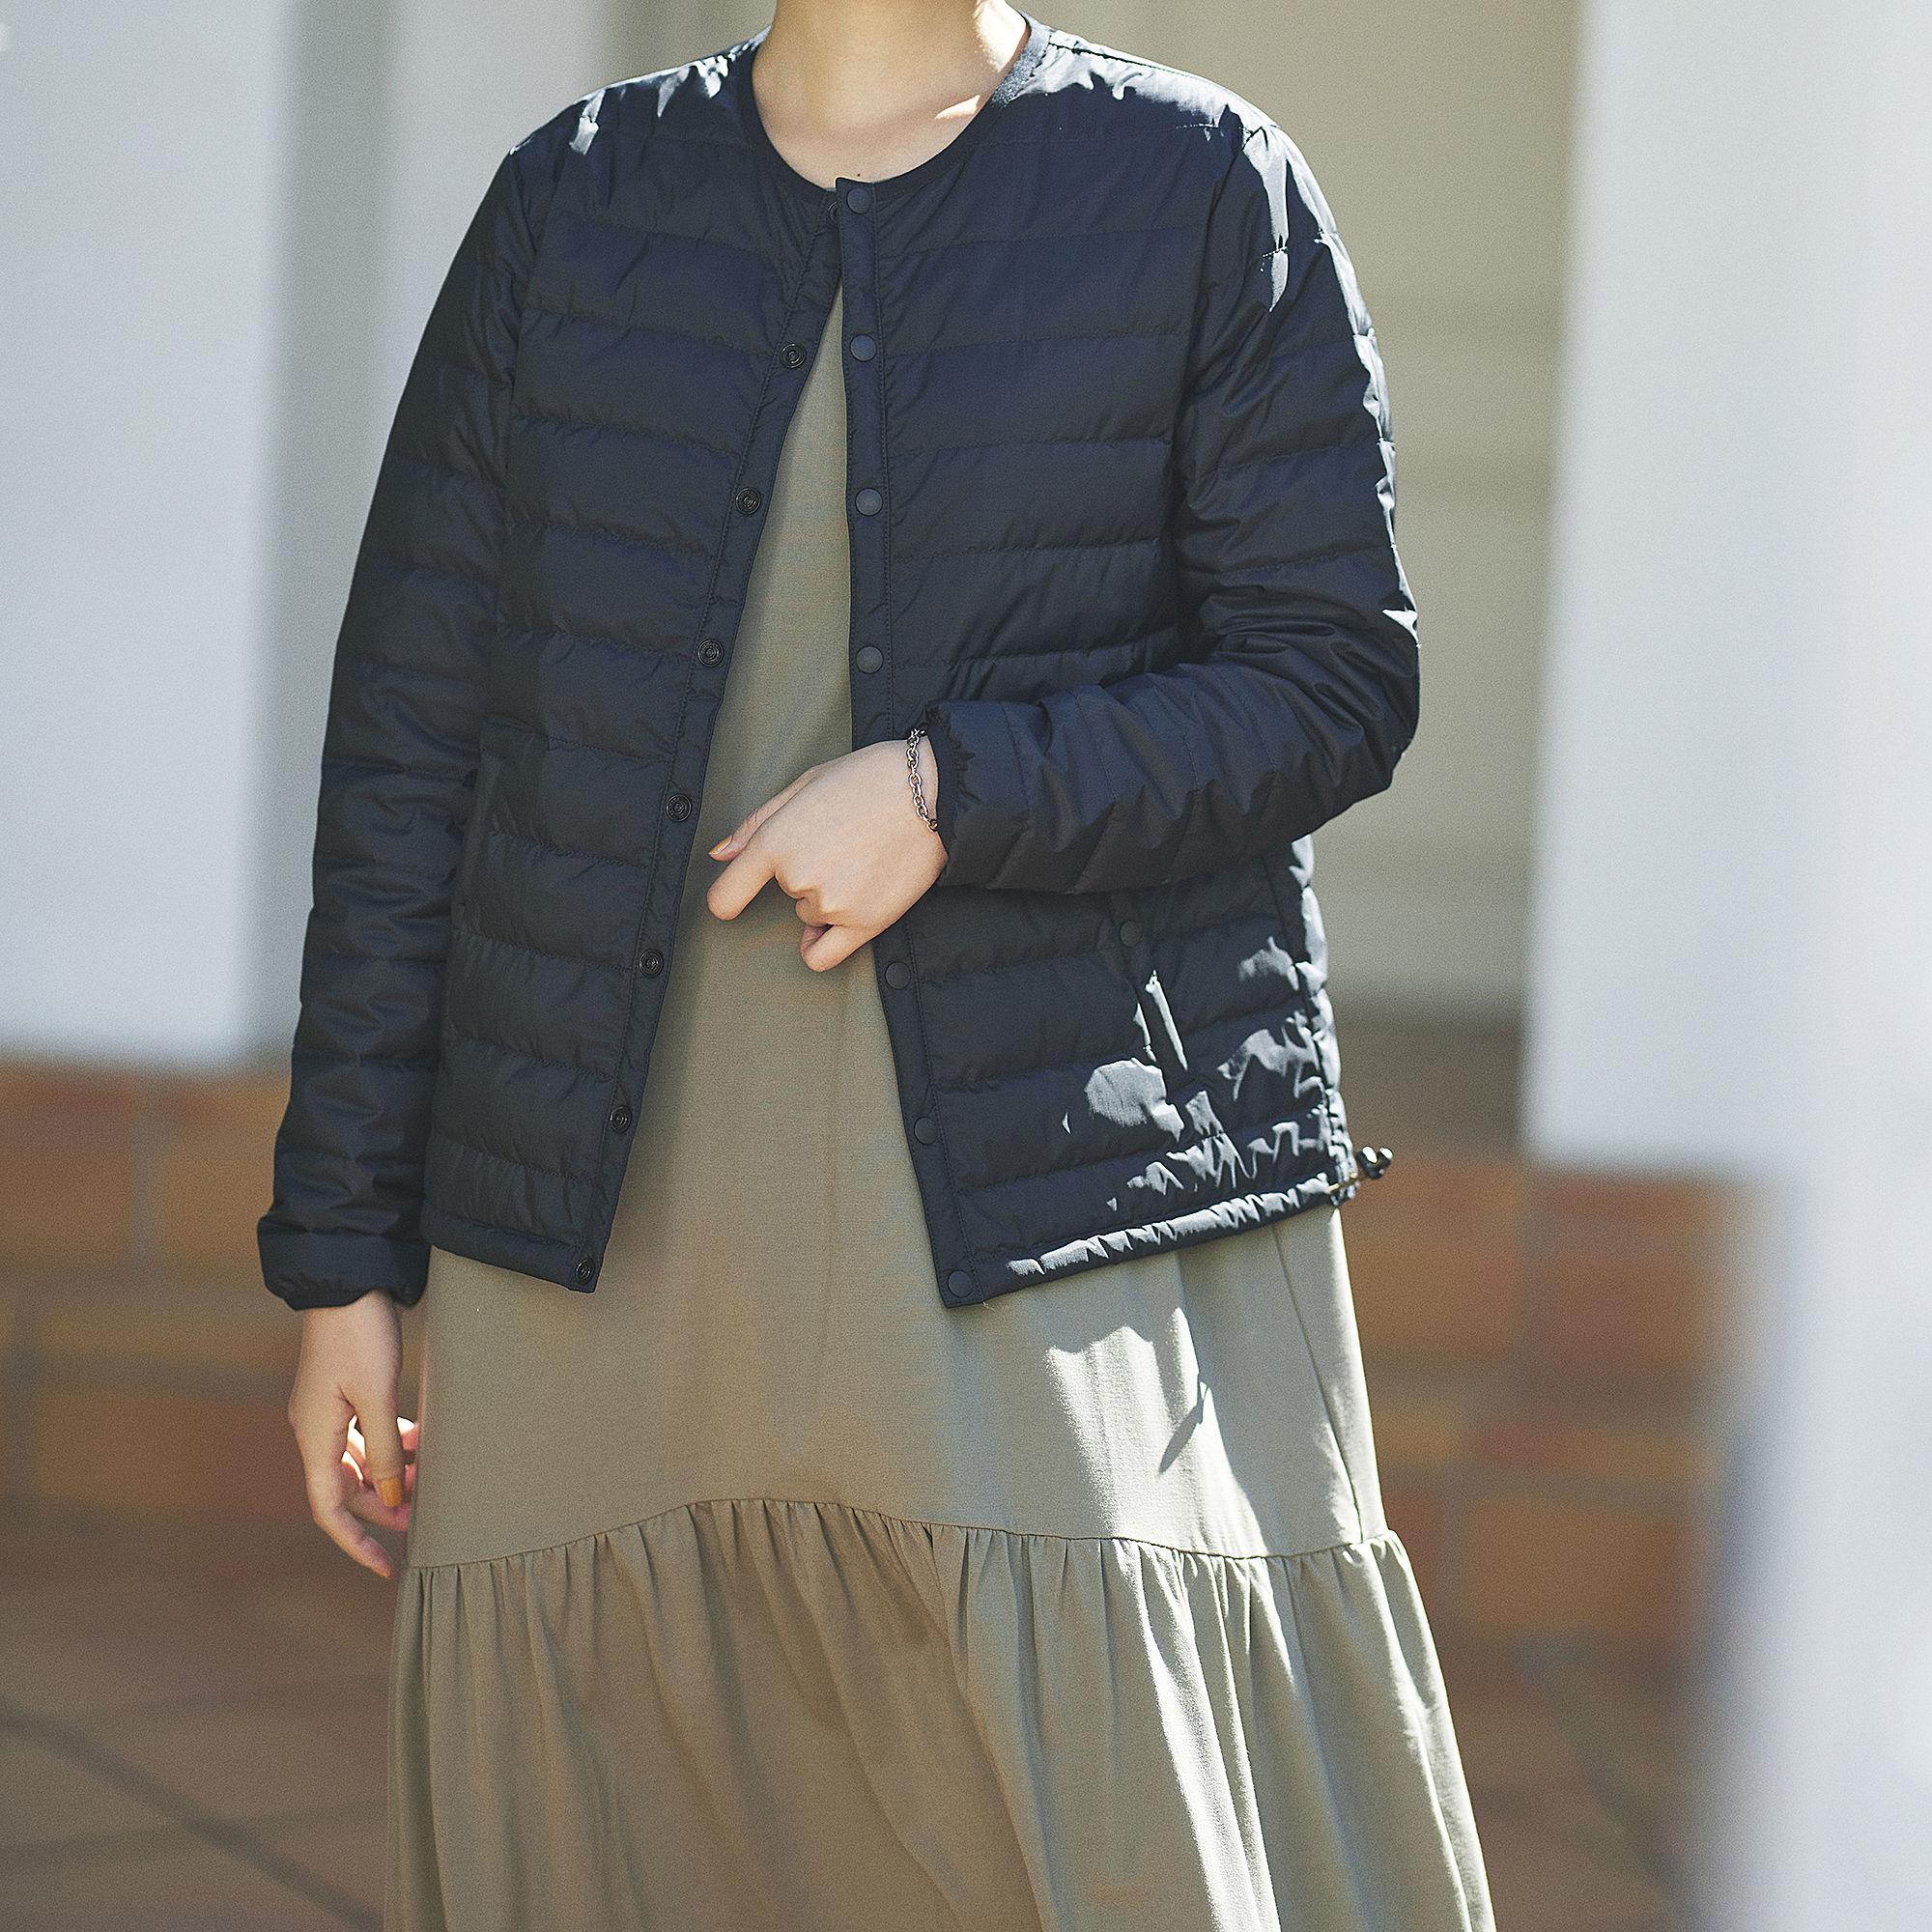 suadeo/【NANGA】コラボ オーロラノーカラーダウンジャケット/¥26,400